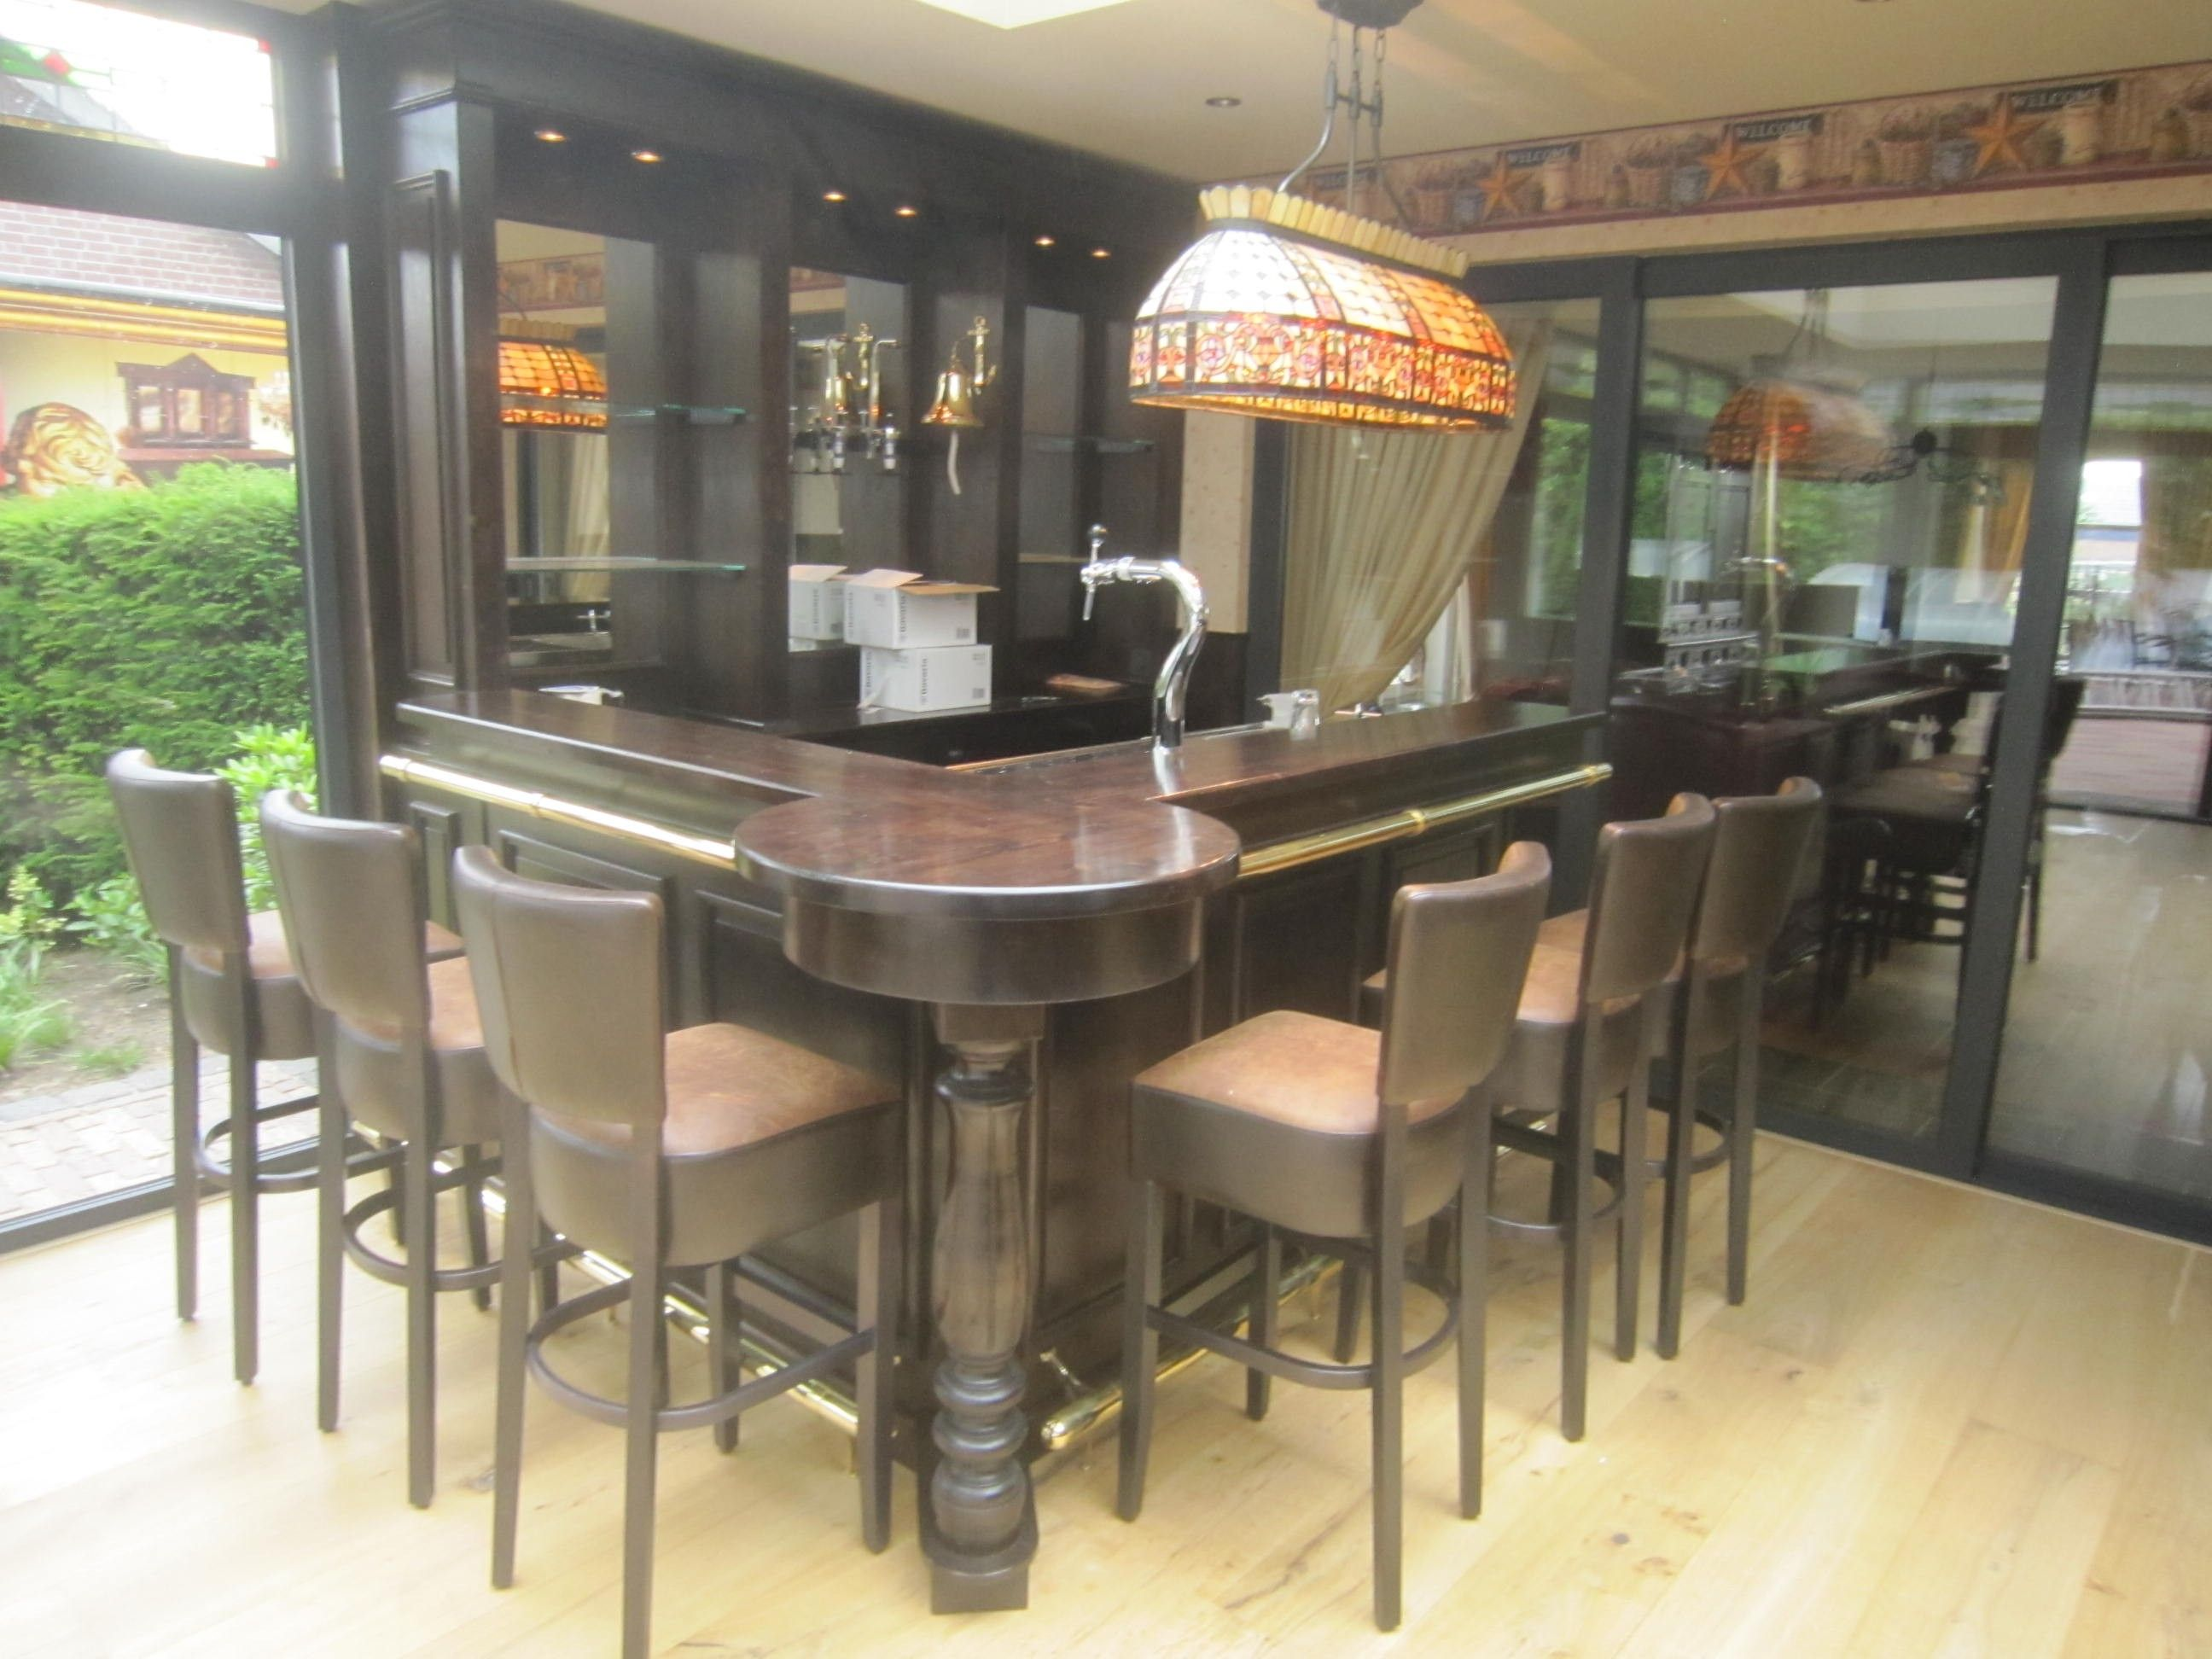 horeca tuindecoratie interieur inrichting caf in serre referenties horeca barren en. Black Bedroom Furniture Sets. Home Design Ideas